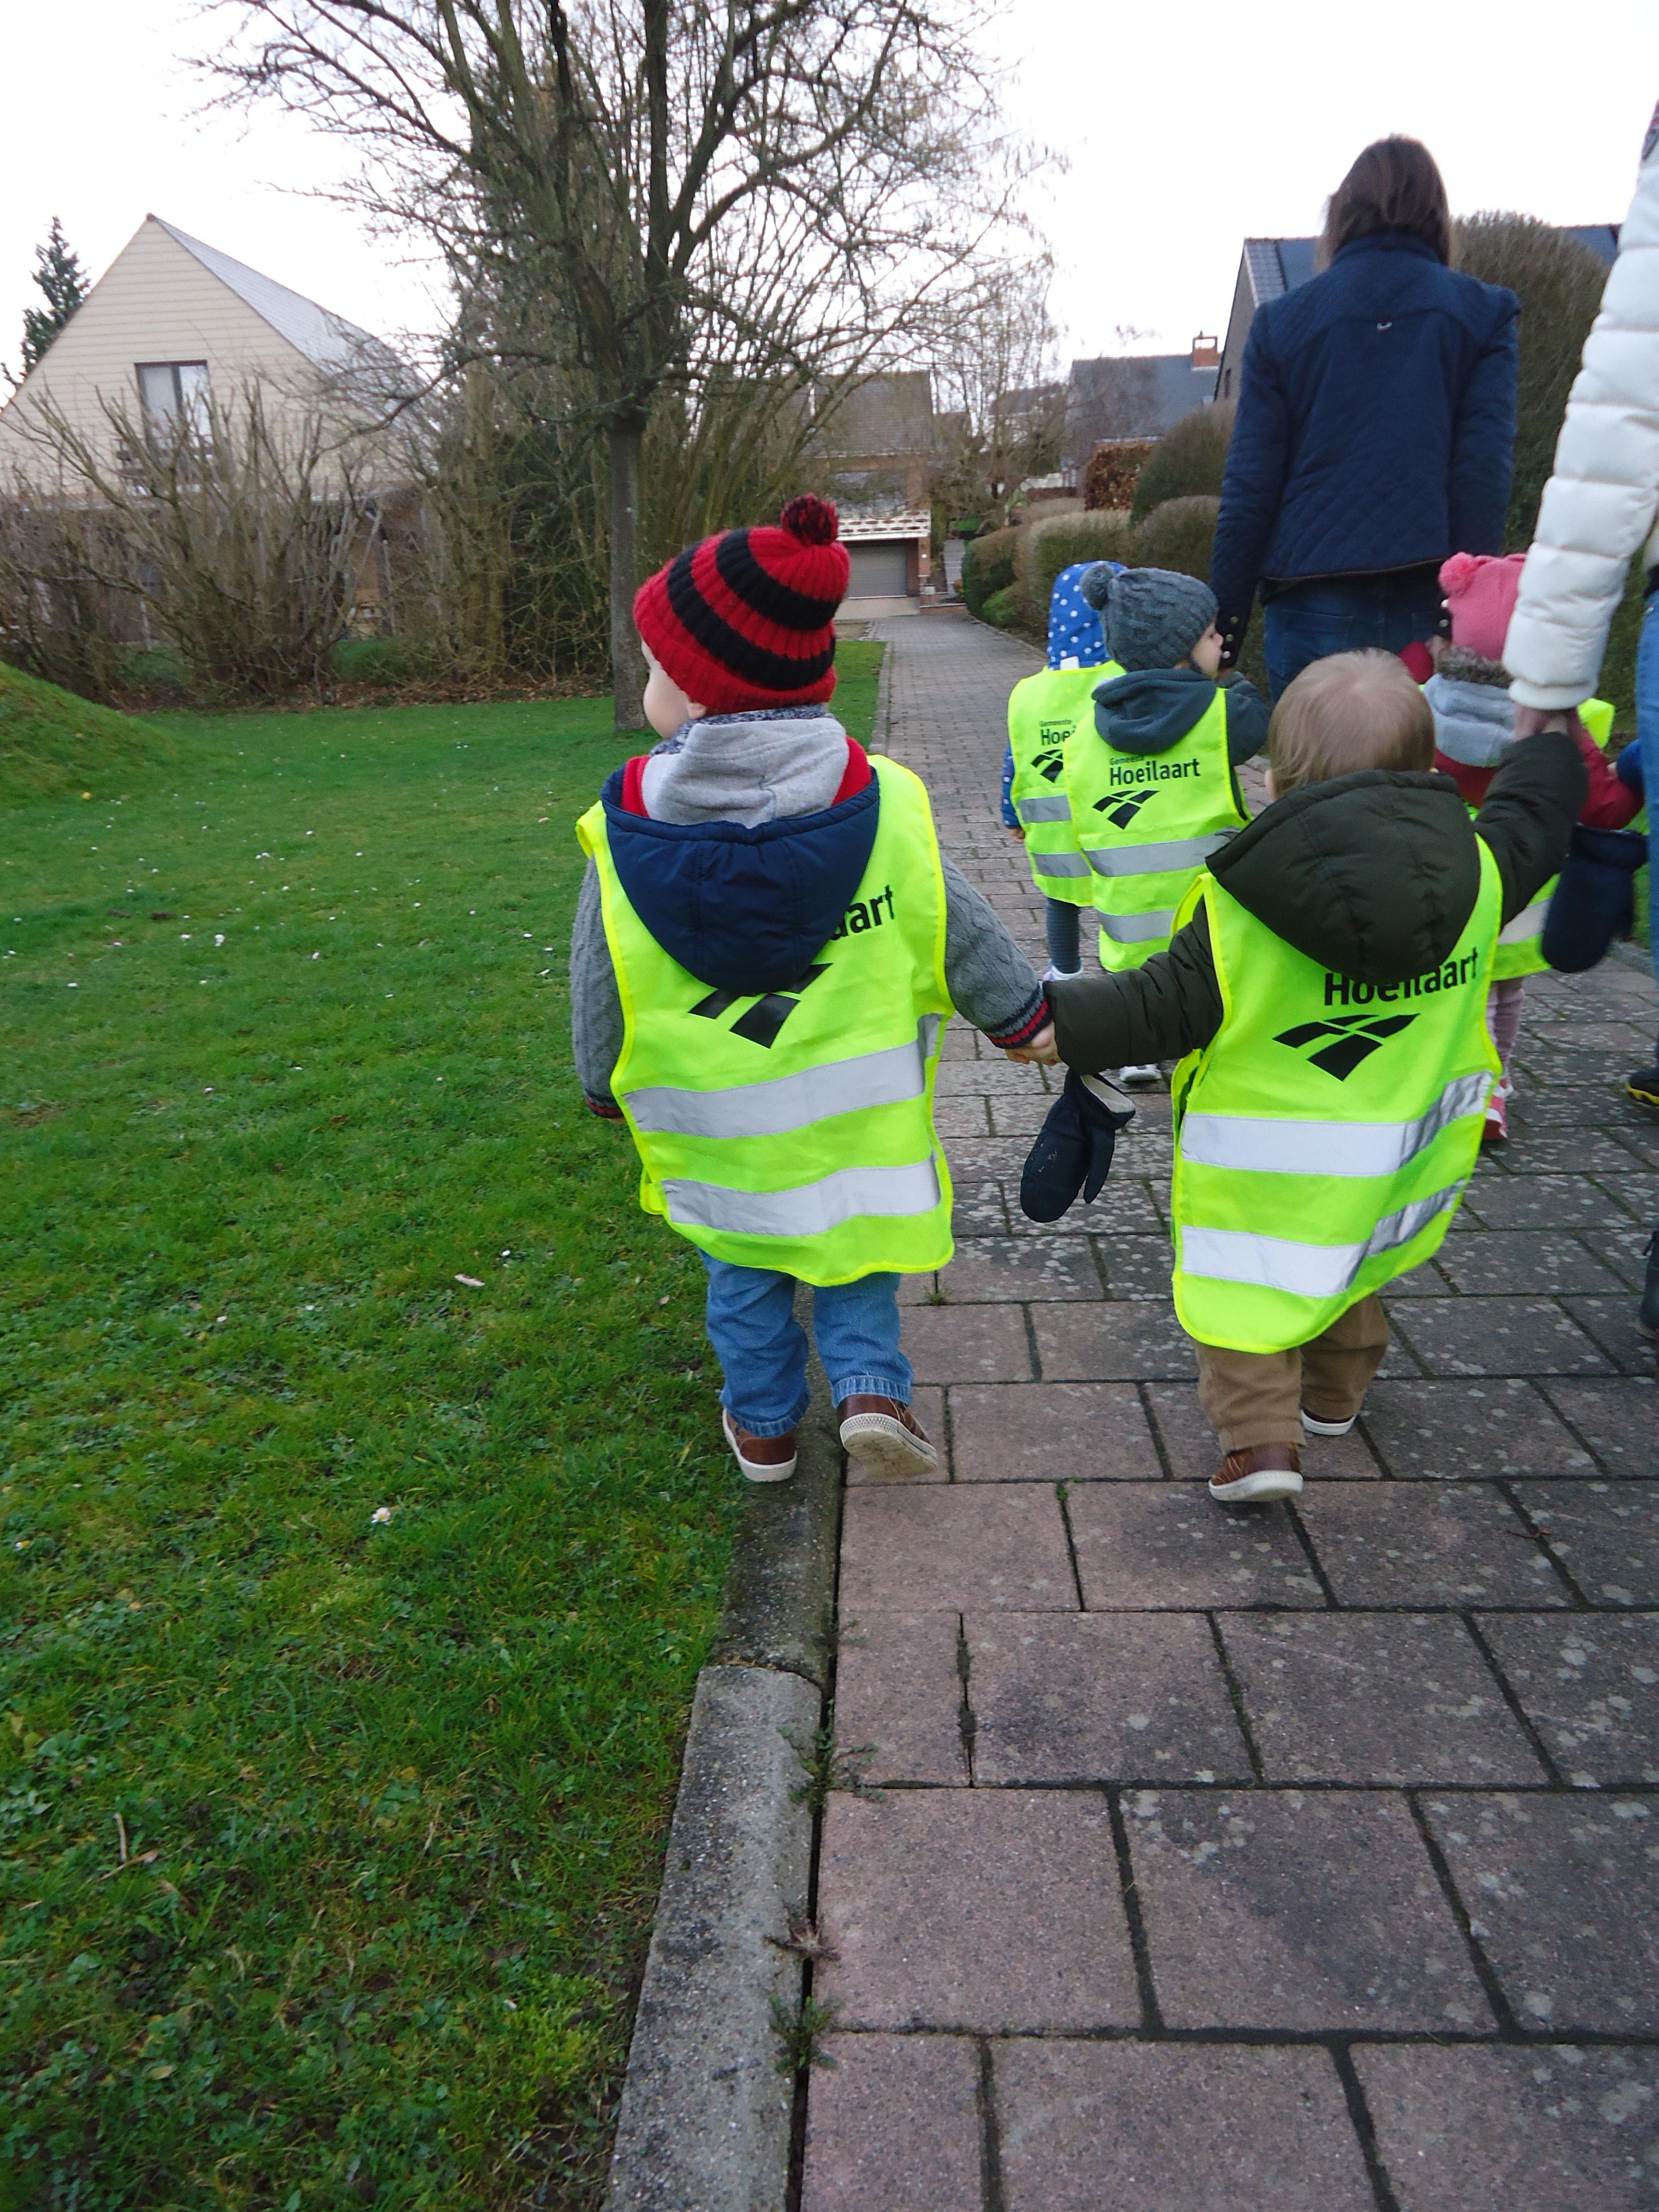 Wandeling kinderdagverblijf-2